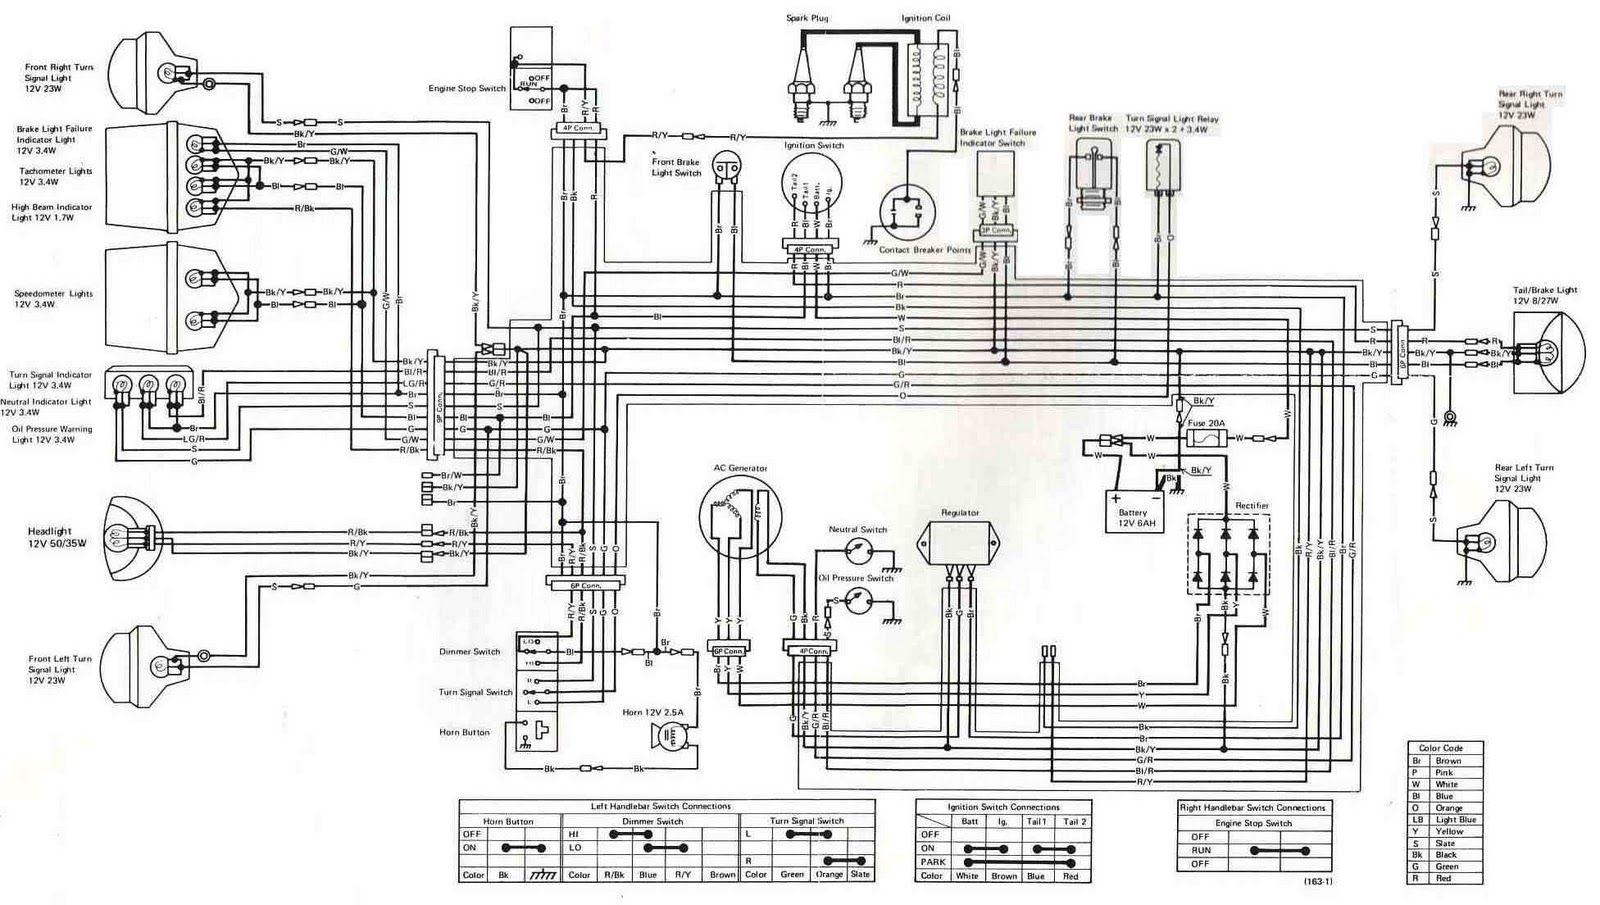 Kawasaki Klf 300 Wiring Diagram / Diagram Database Just